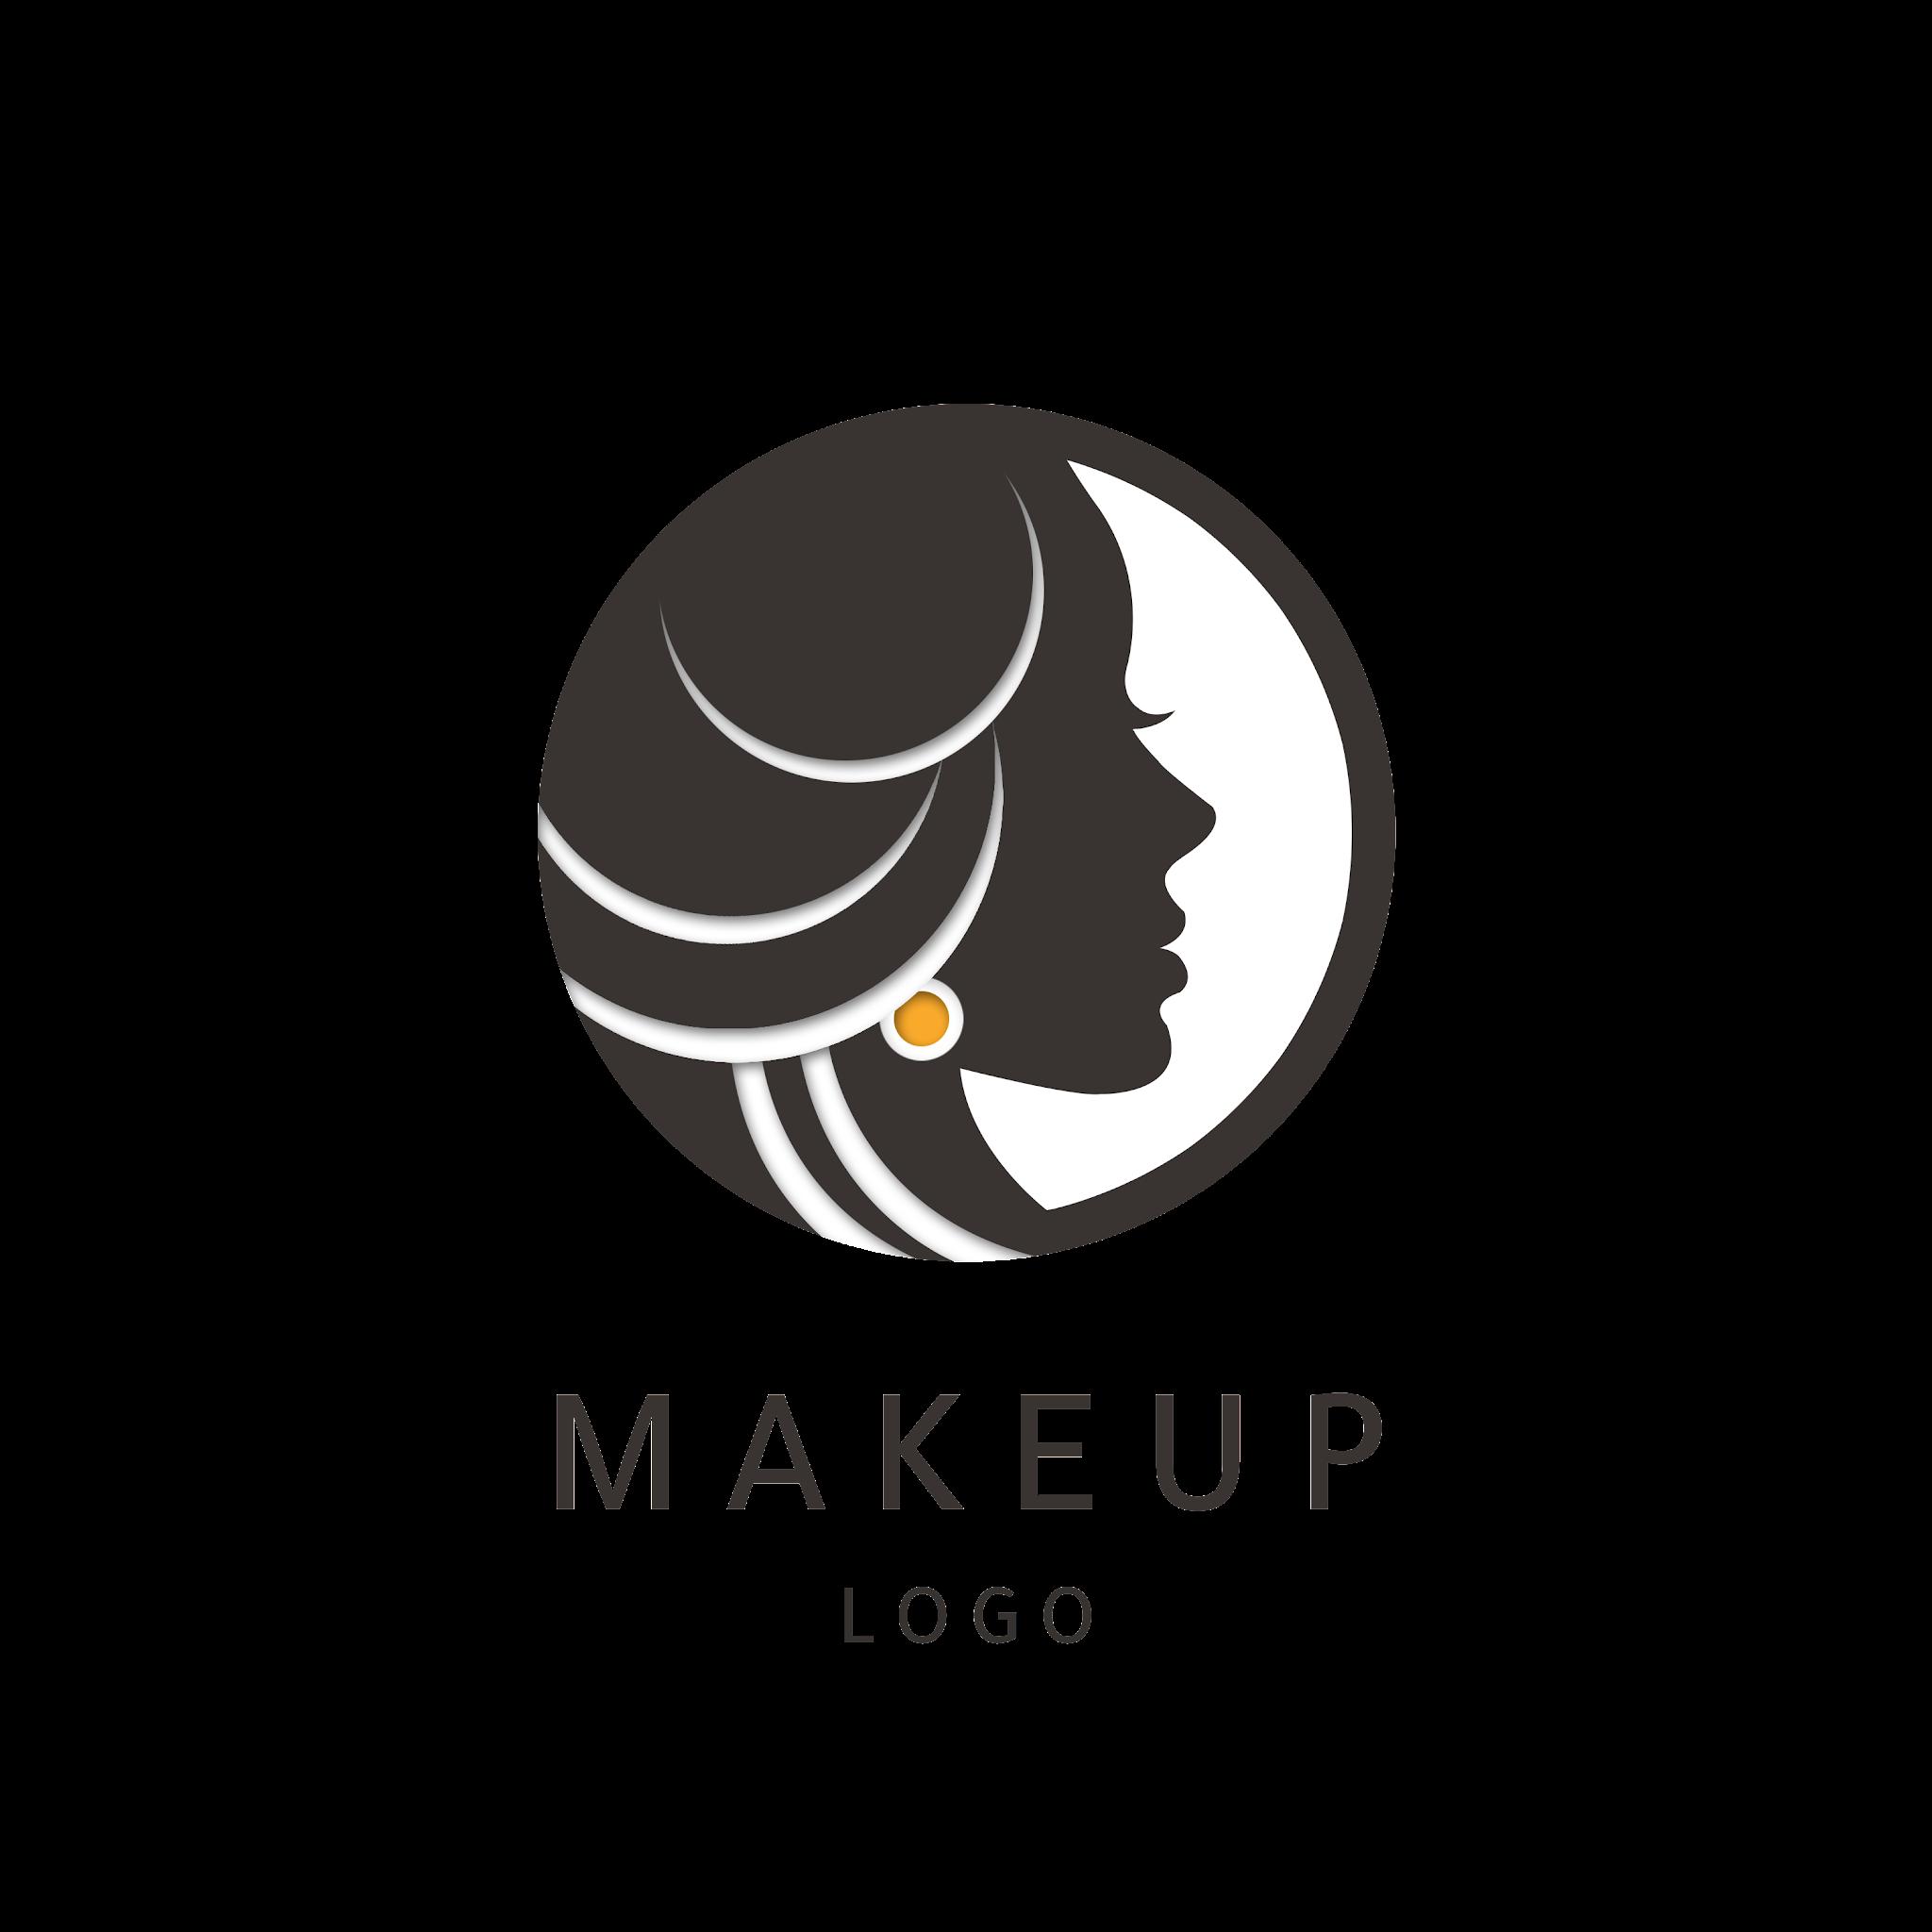 Woman Girl Logo Abstract Circle Shape Design - Logotype Free Vector